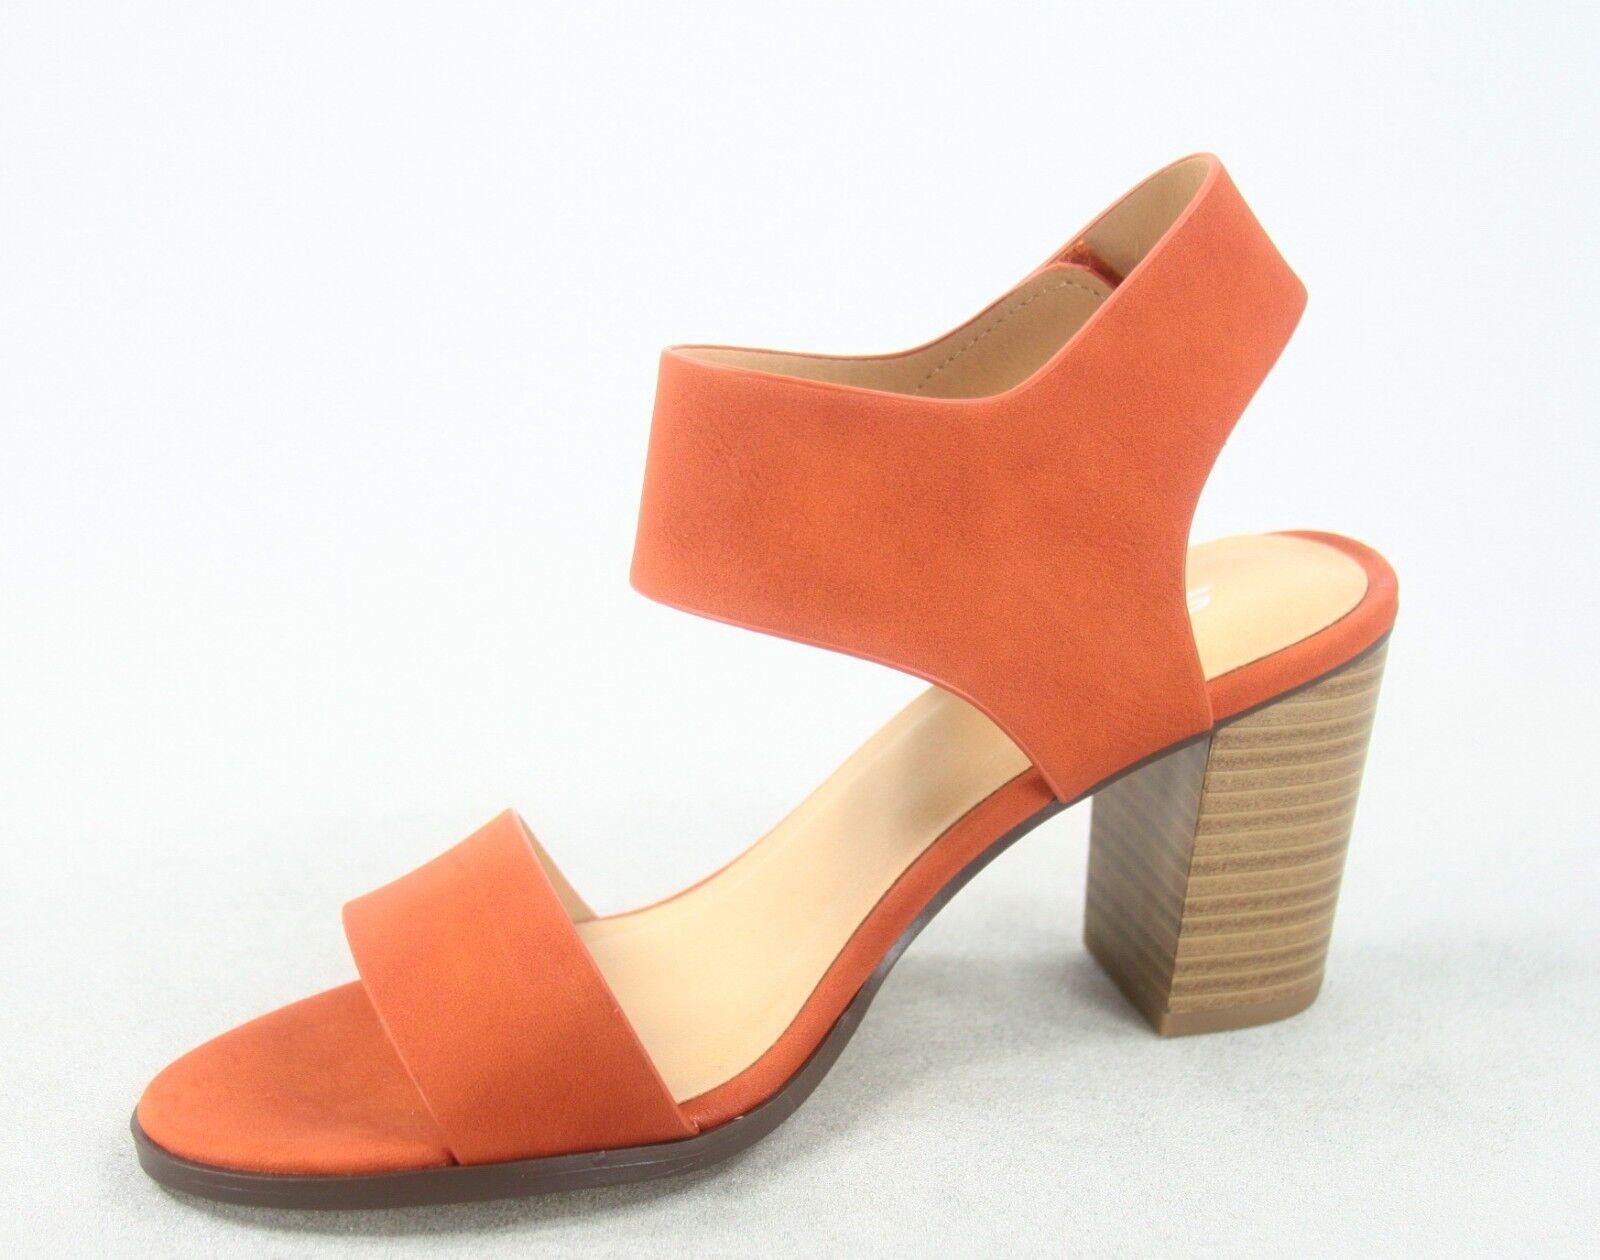 Women Chunky Block High Heel Dress Shoes Morris88 Pearl T-Strap Sandal